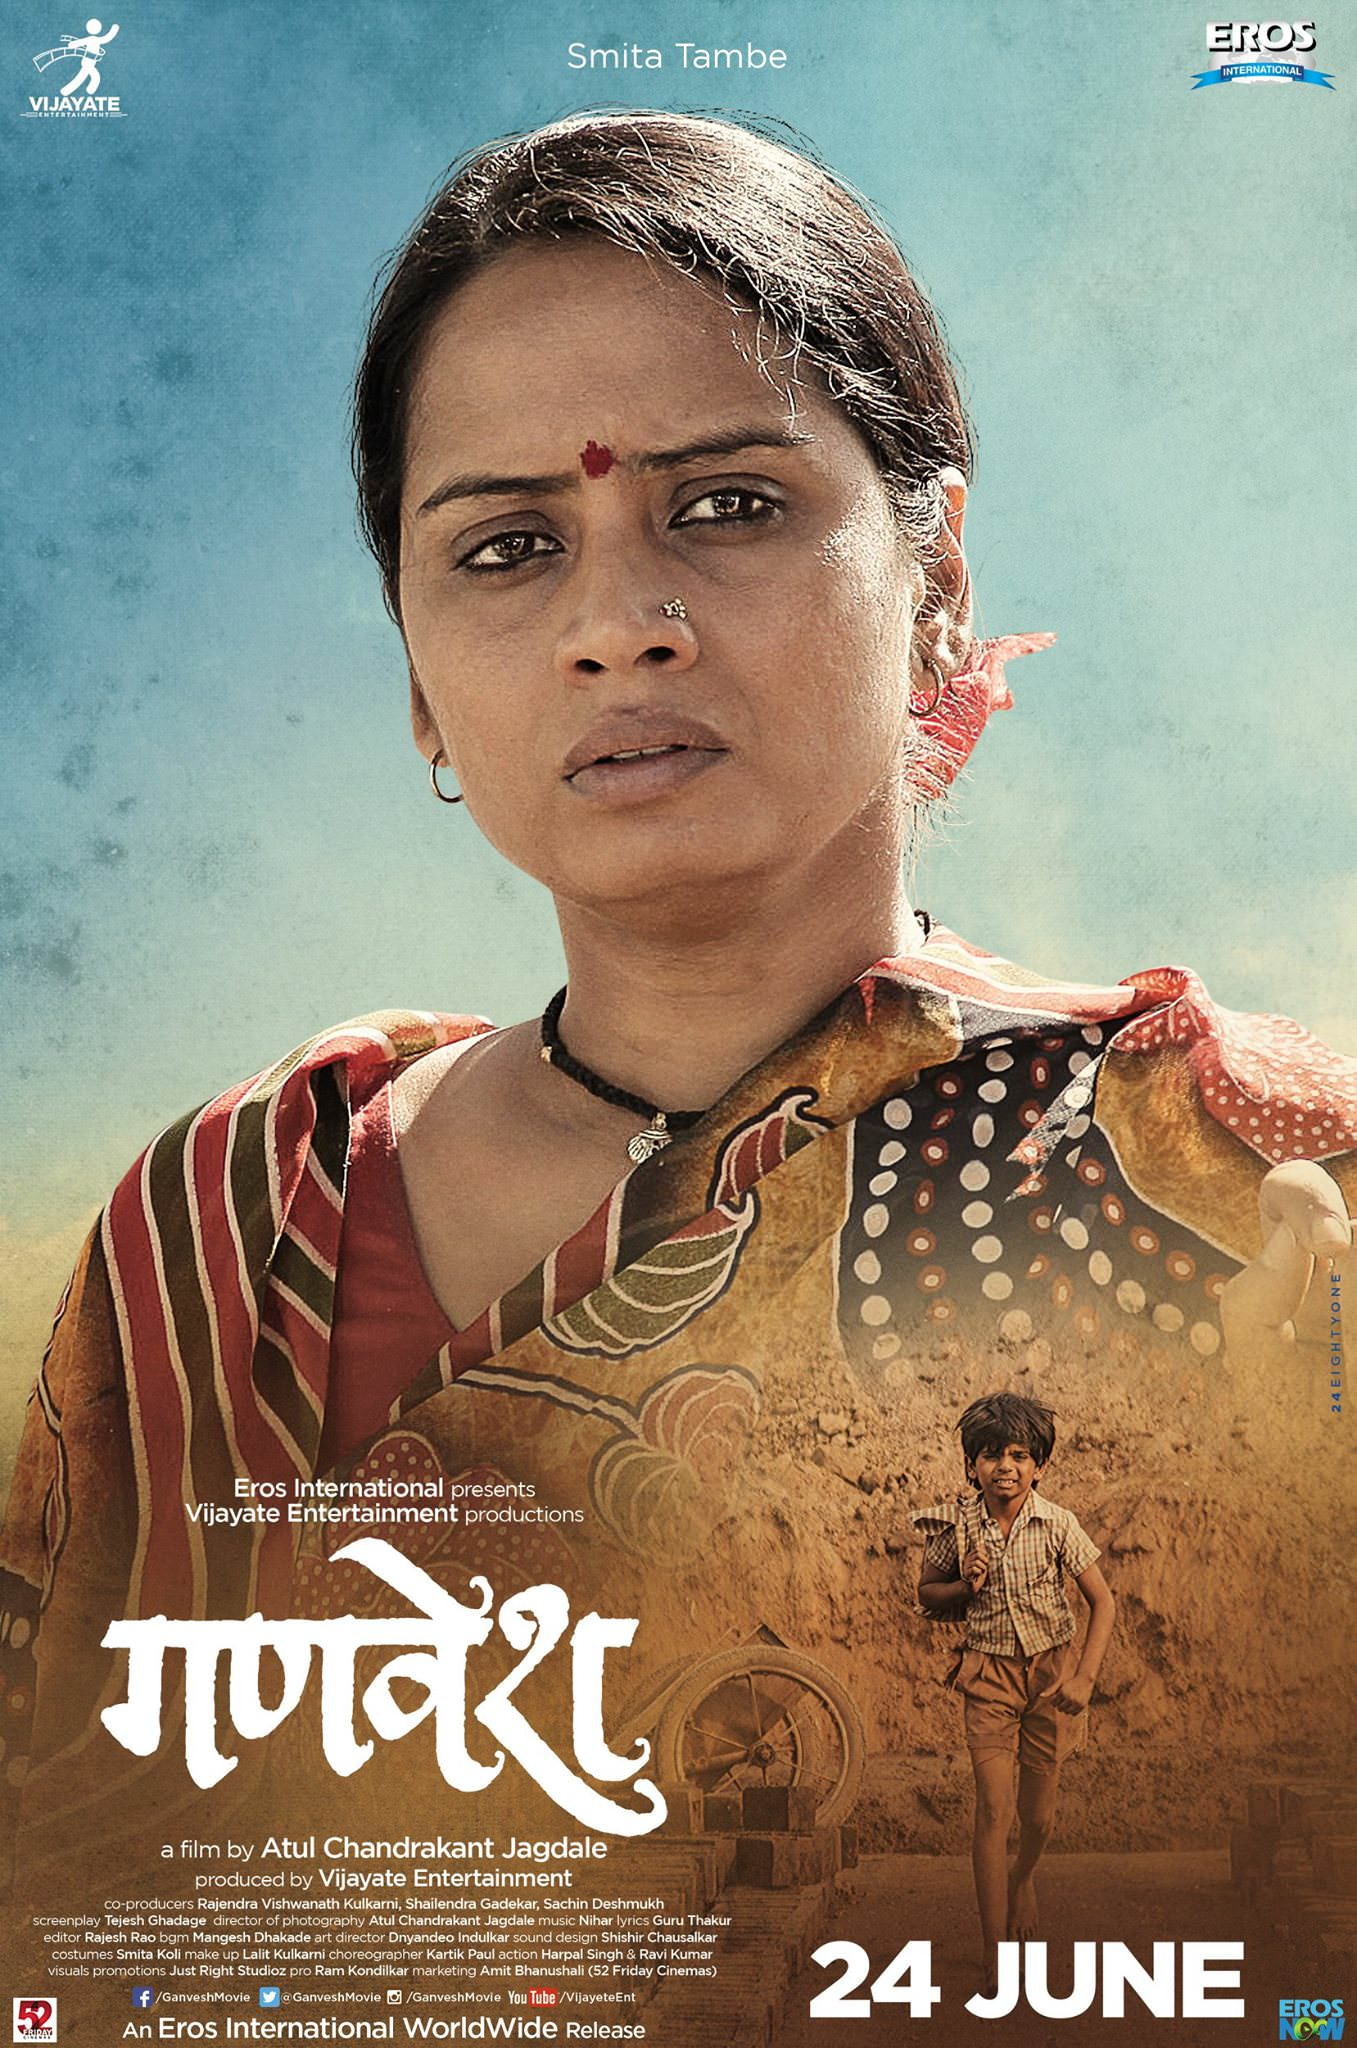 marathi cast smita movies posters tambe release date crew wiki story marathistars